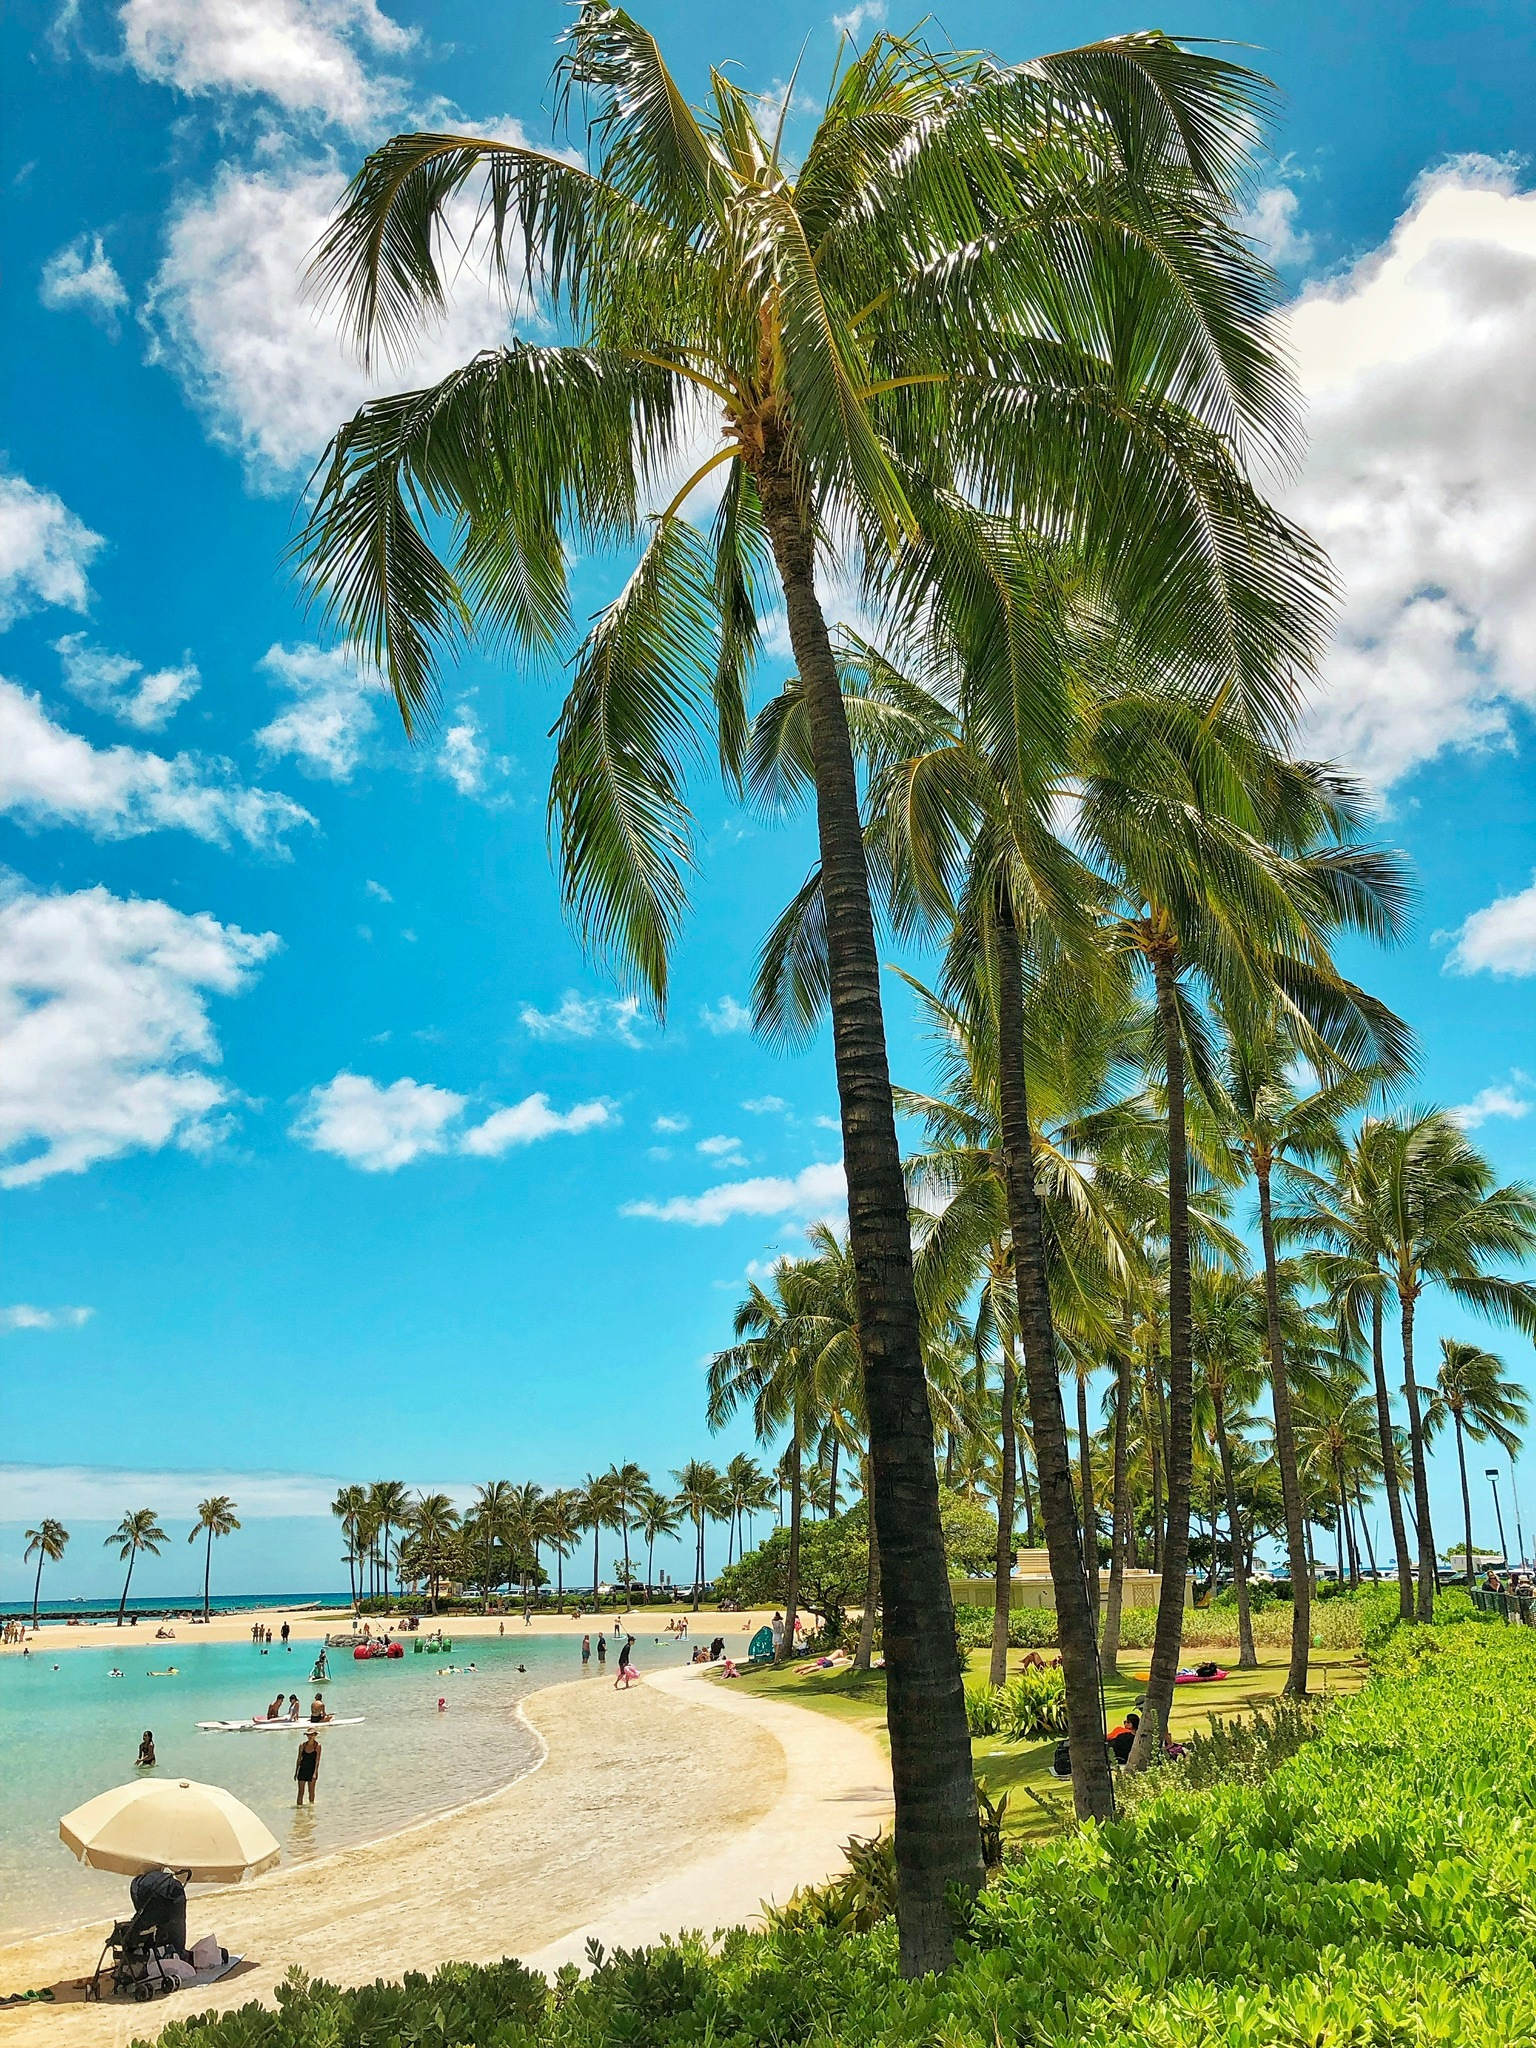 Waikiki Hawaii by gianlucadonadio97